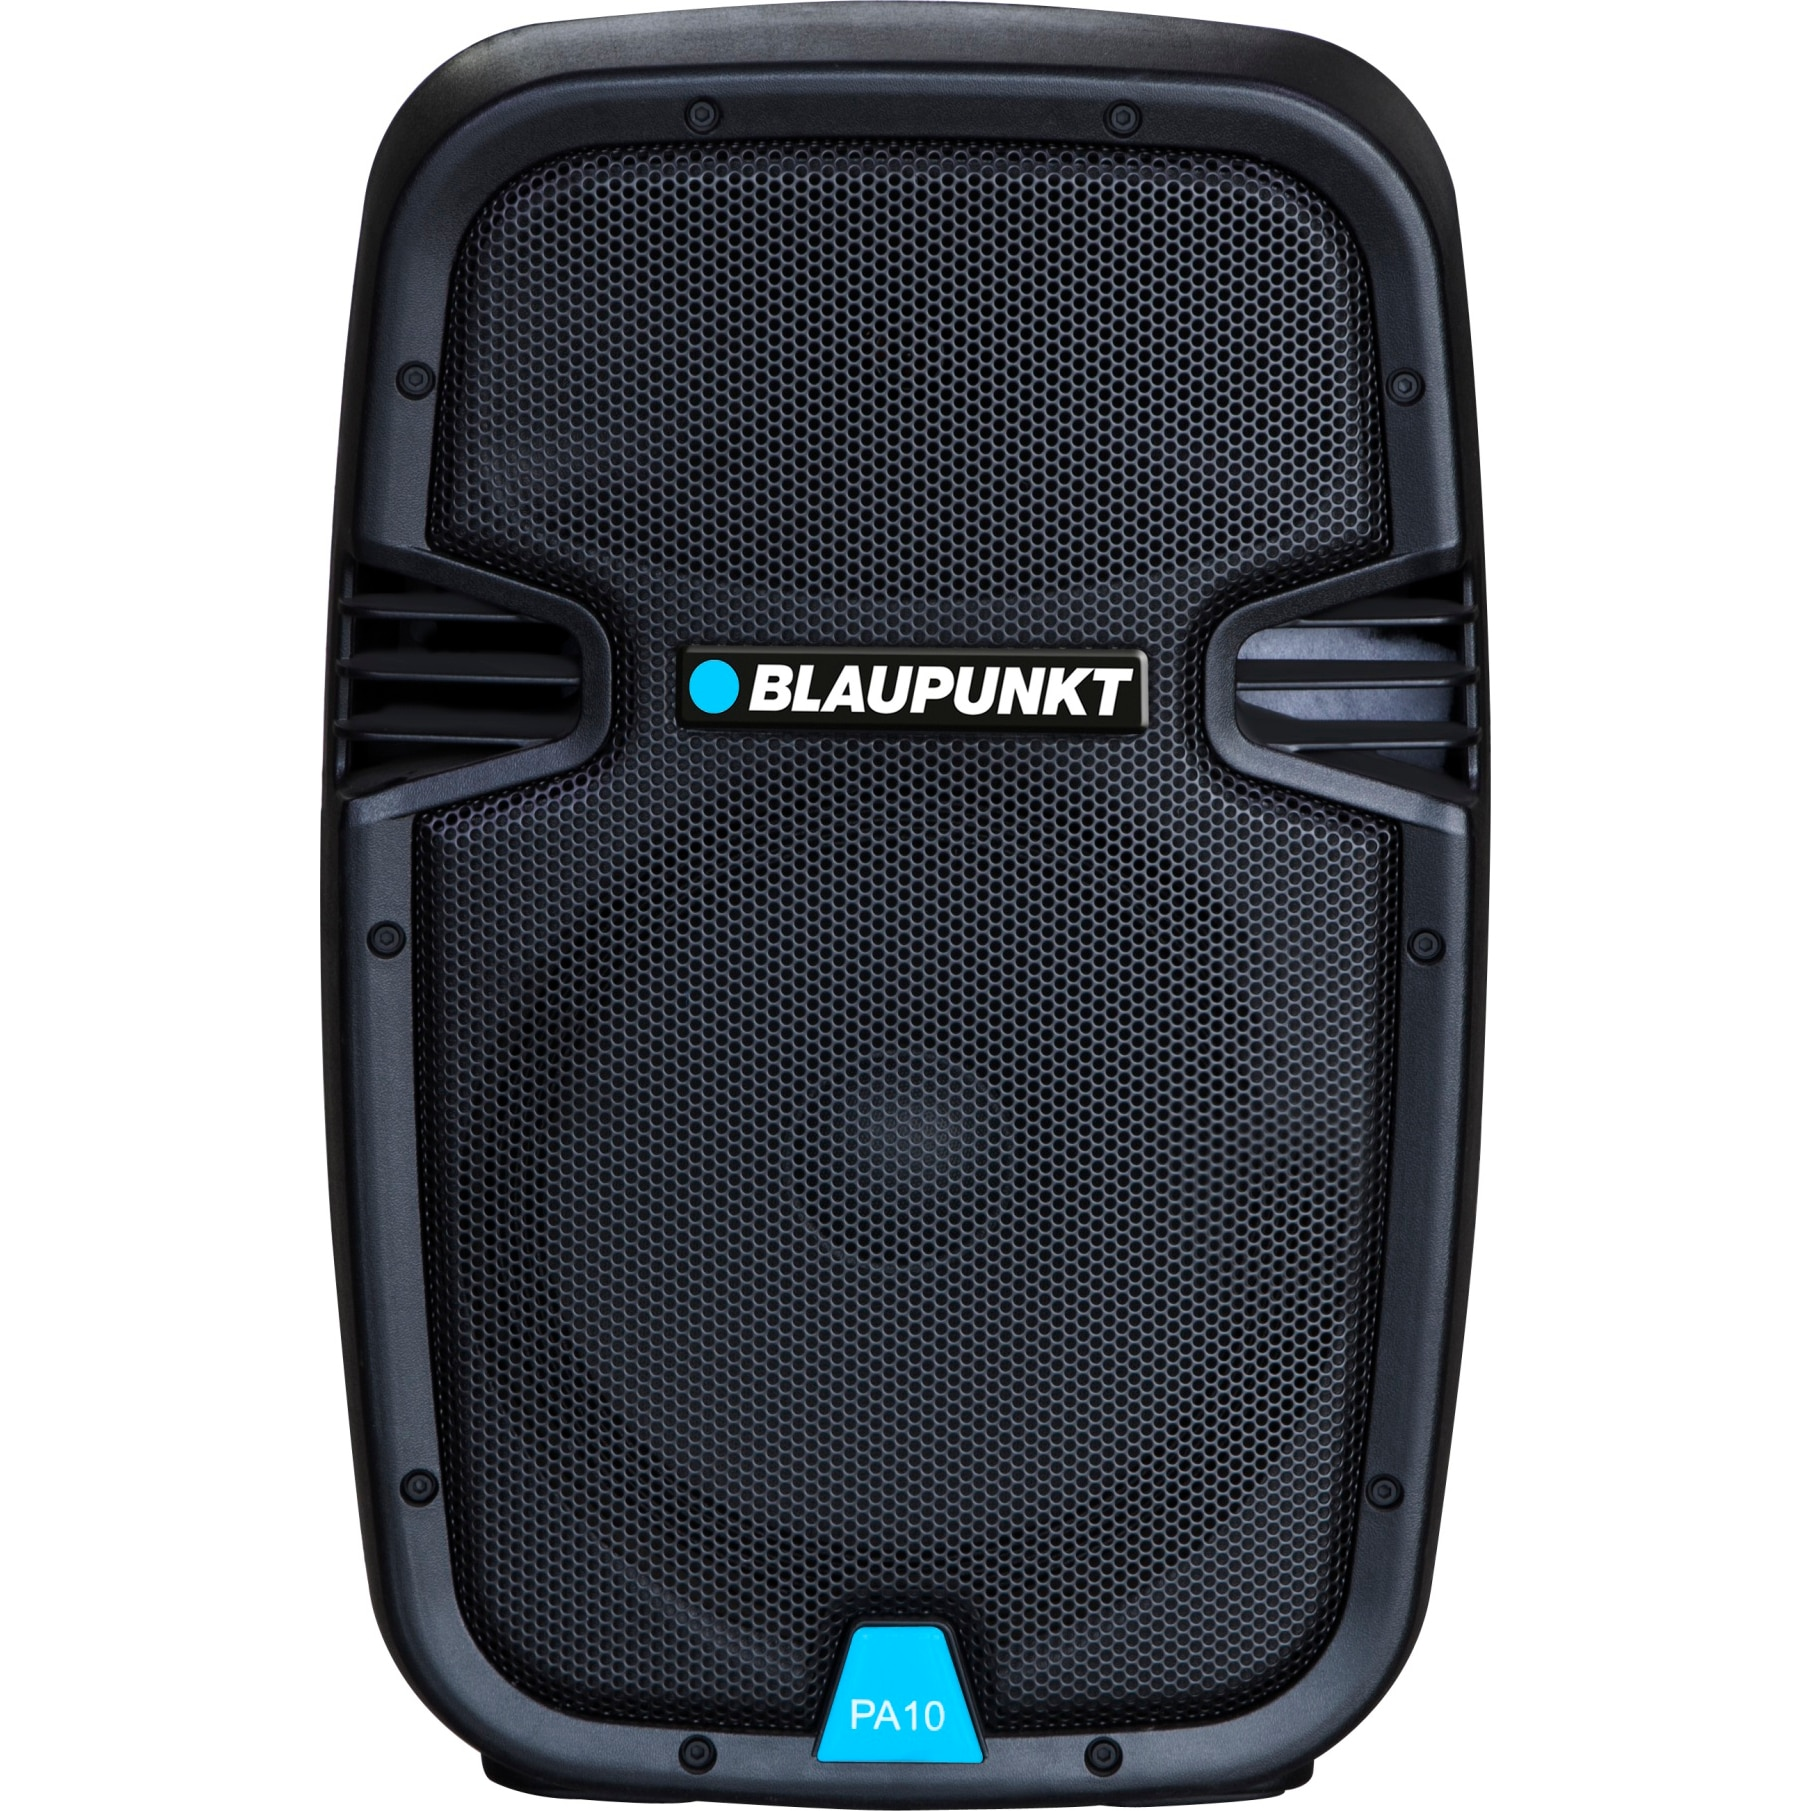 Fotografie Boxa portabila profesionala Blaupunkt, PA10, Bluetooth, FM/SD/USB/AUX/KARAOKE, 600W